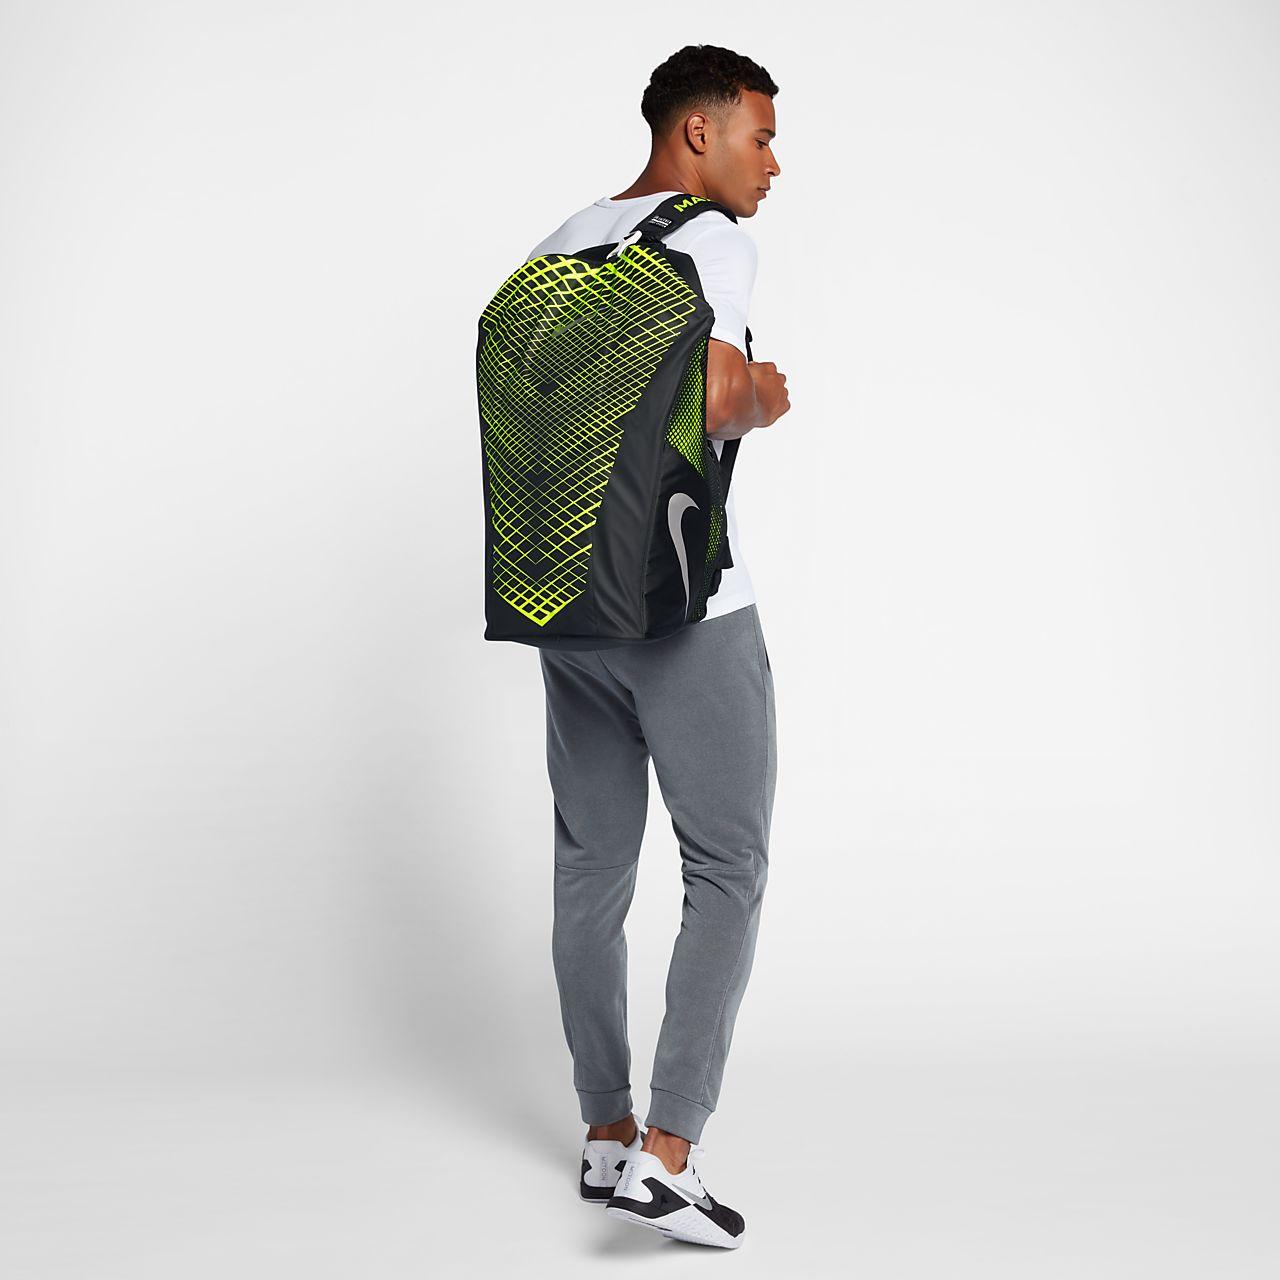 73b2033f904 ... quality design 16807 1ac5c nike nike duffel bag nike vapor max air  medium training duffel bag ...